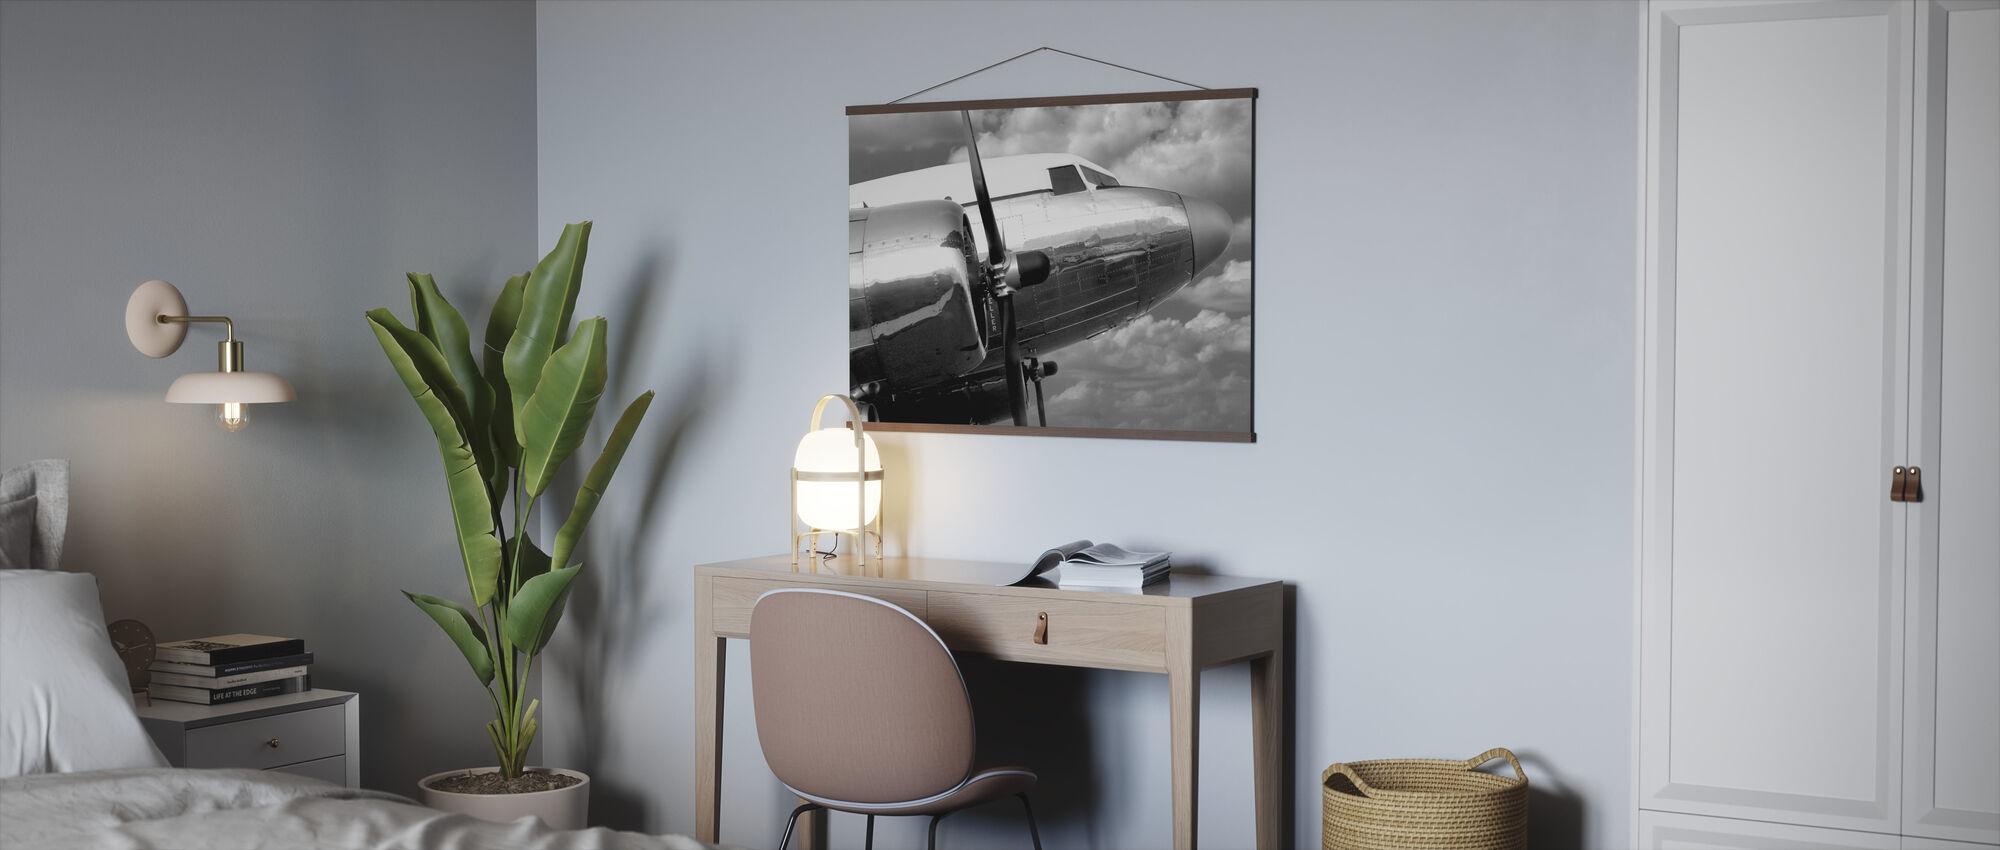 Airborne 3 - Poster - Kantoor